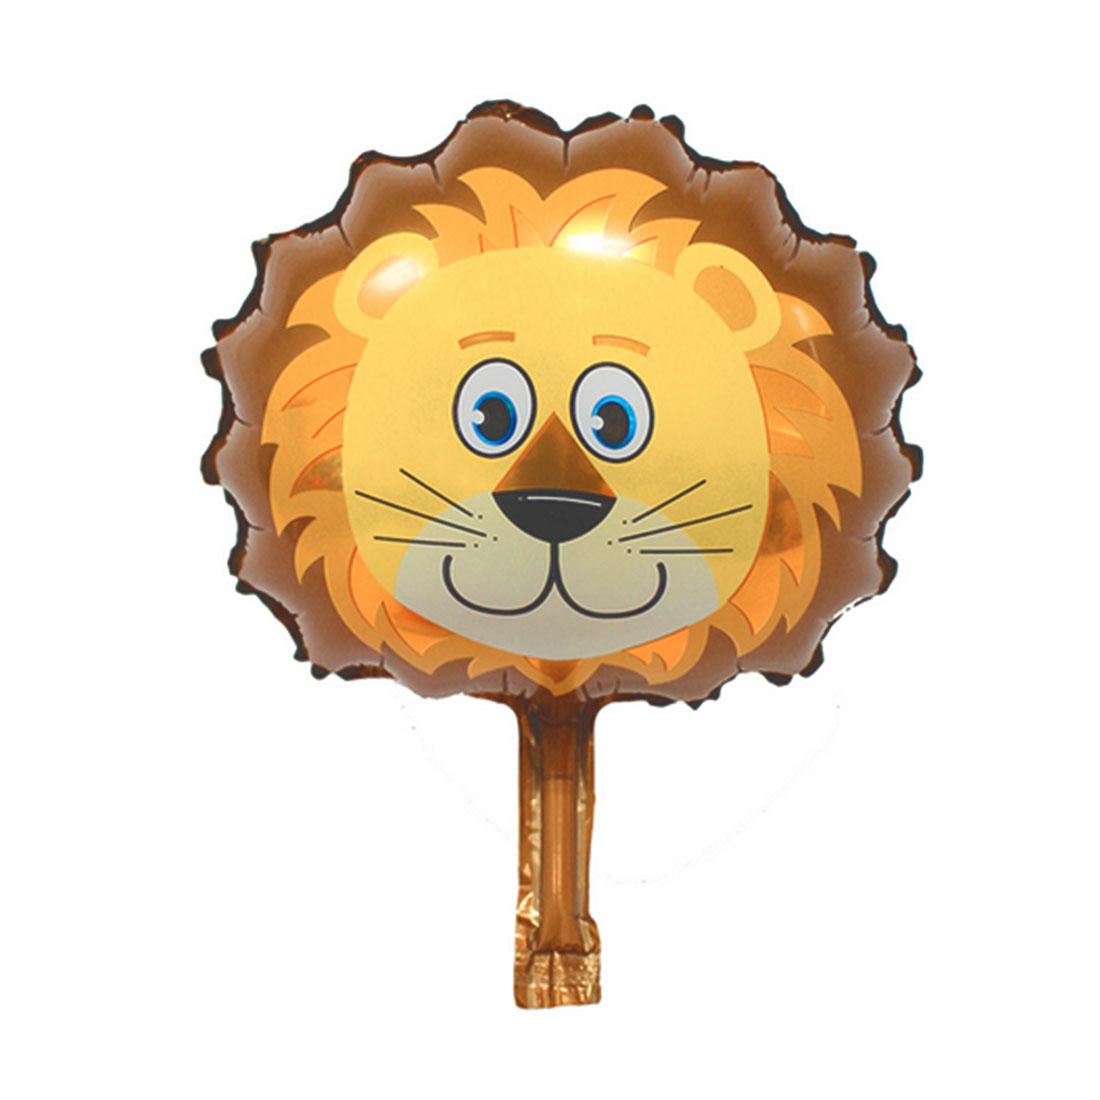 Foil Lion Design Inflation Helium Balloon Birthday Festival Celebration Anniversary Ornament 9 Inch